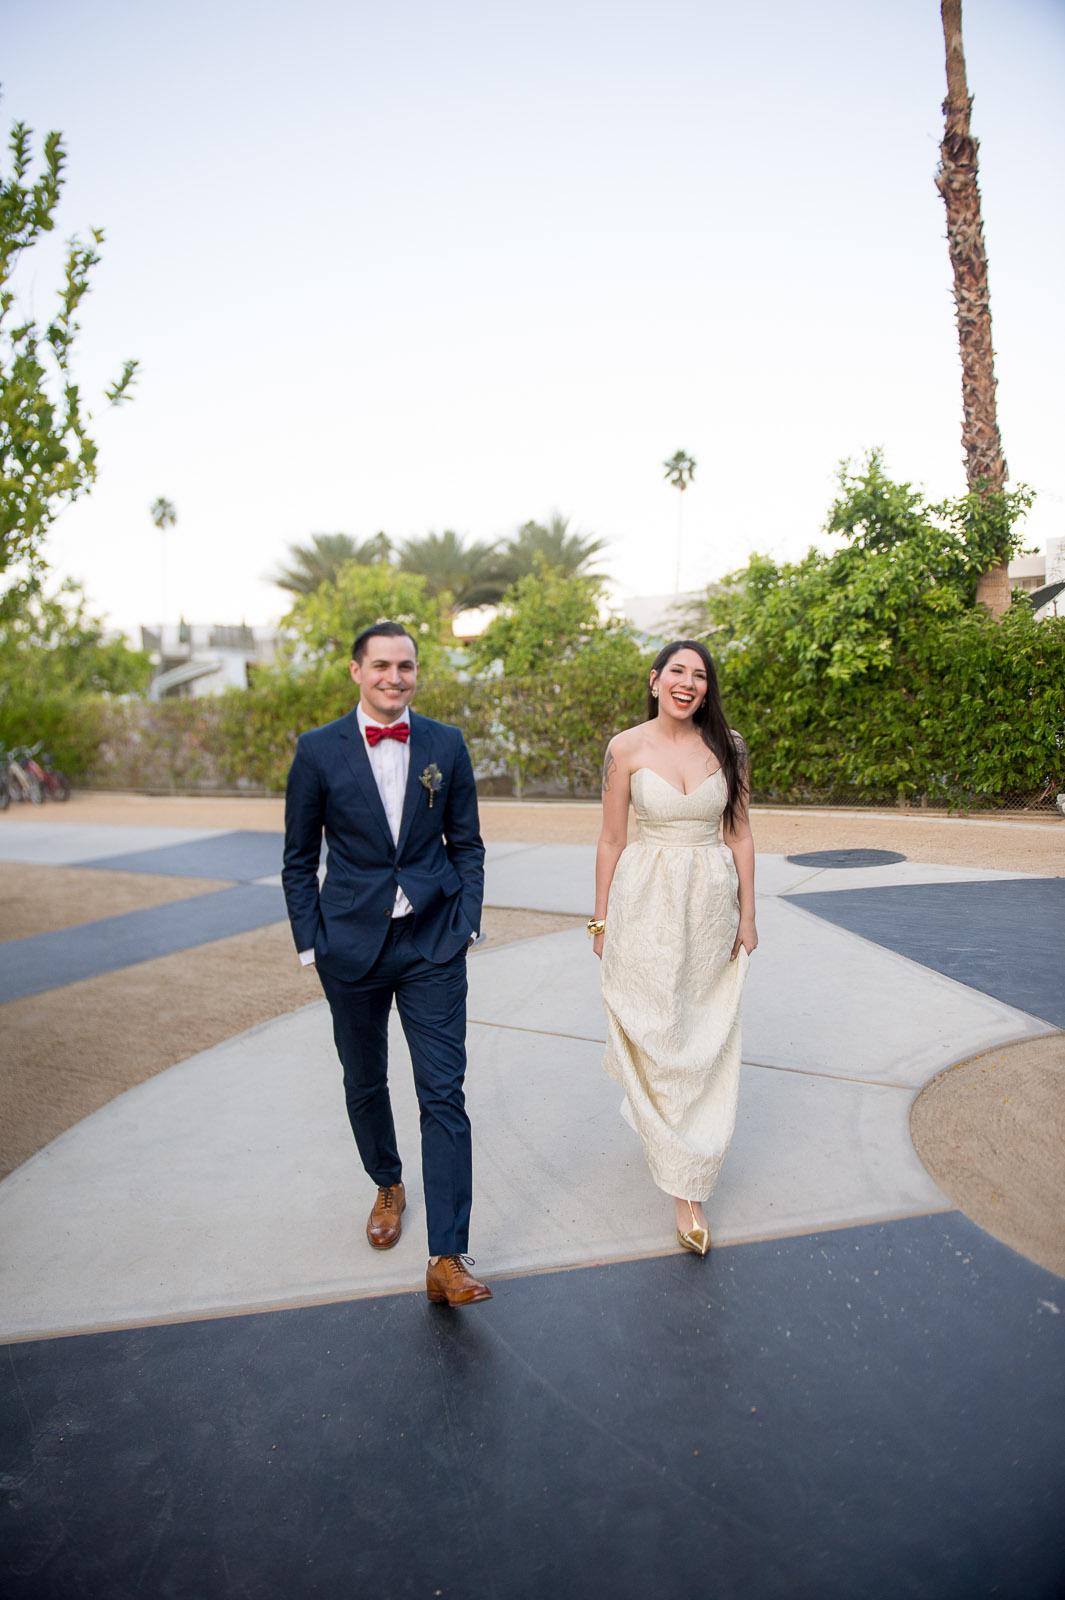 ace-hotel-palm-springs-wedding-38.jpg